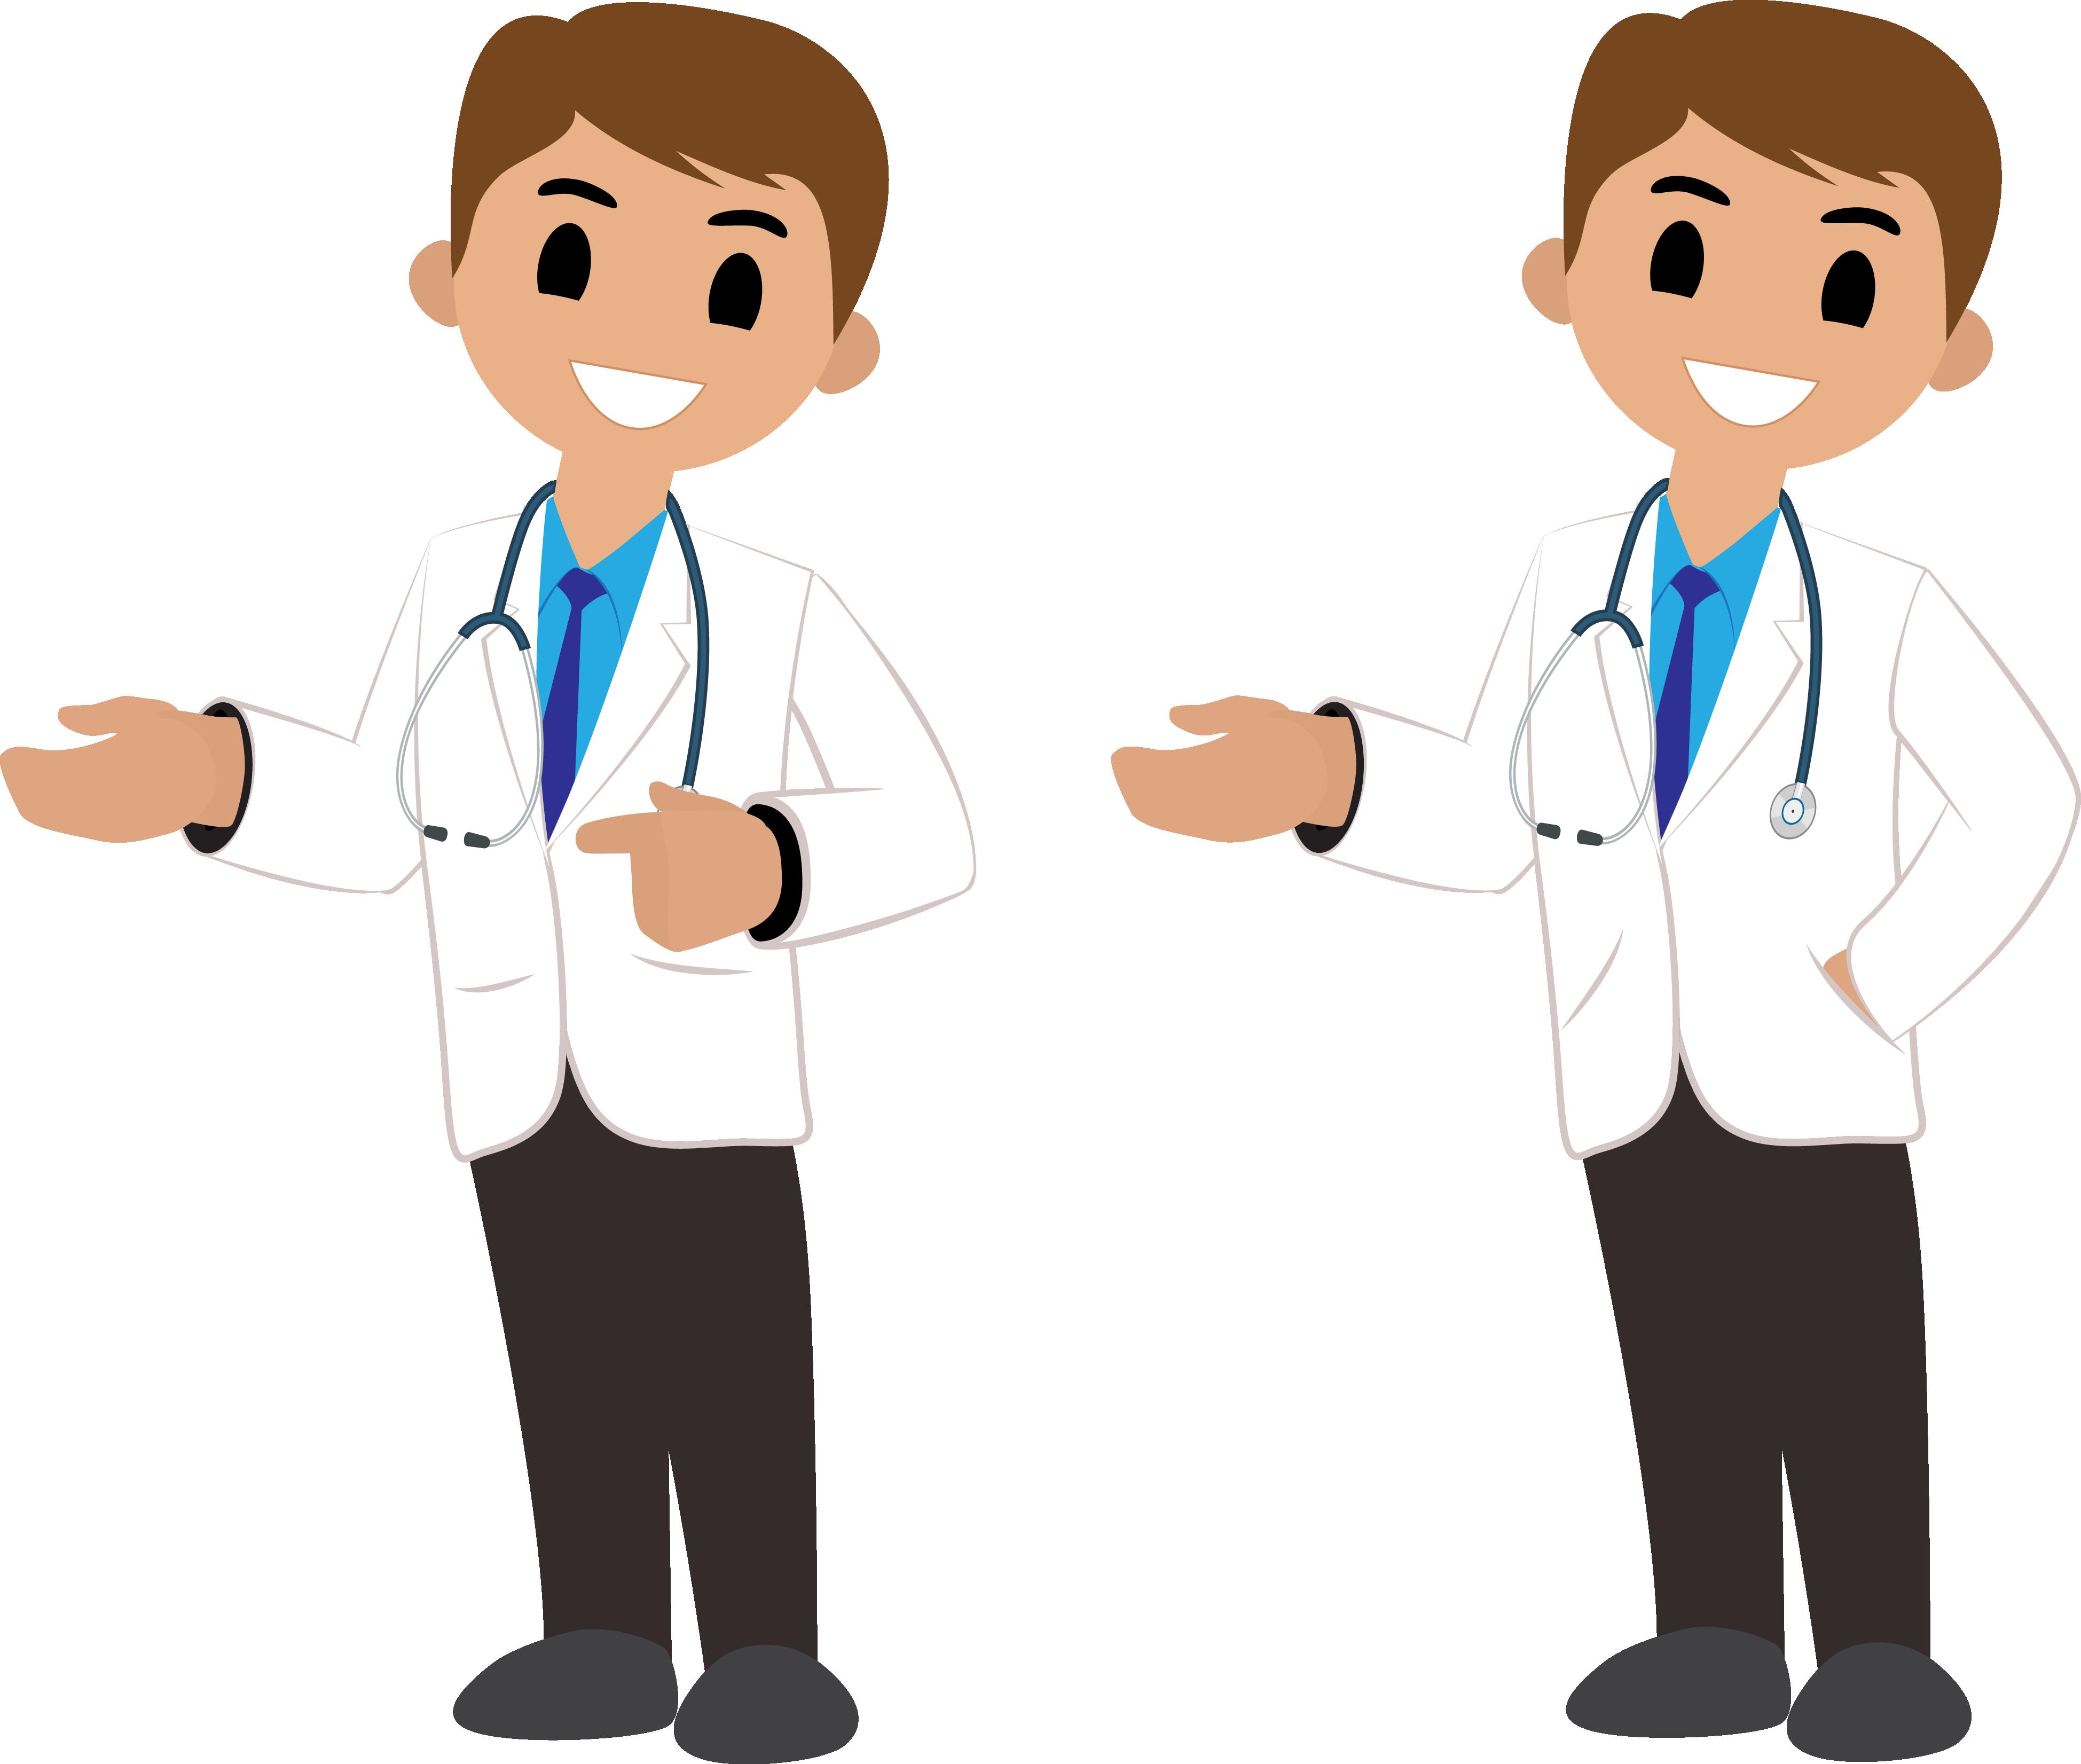 Stethoscope Physician.